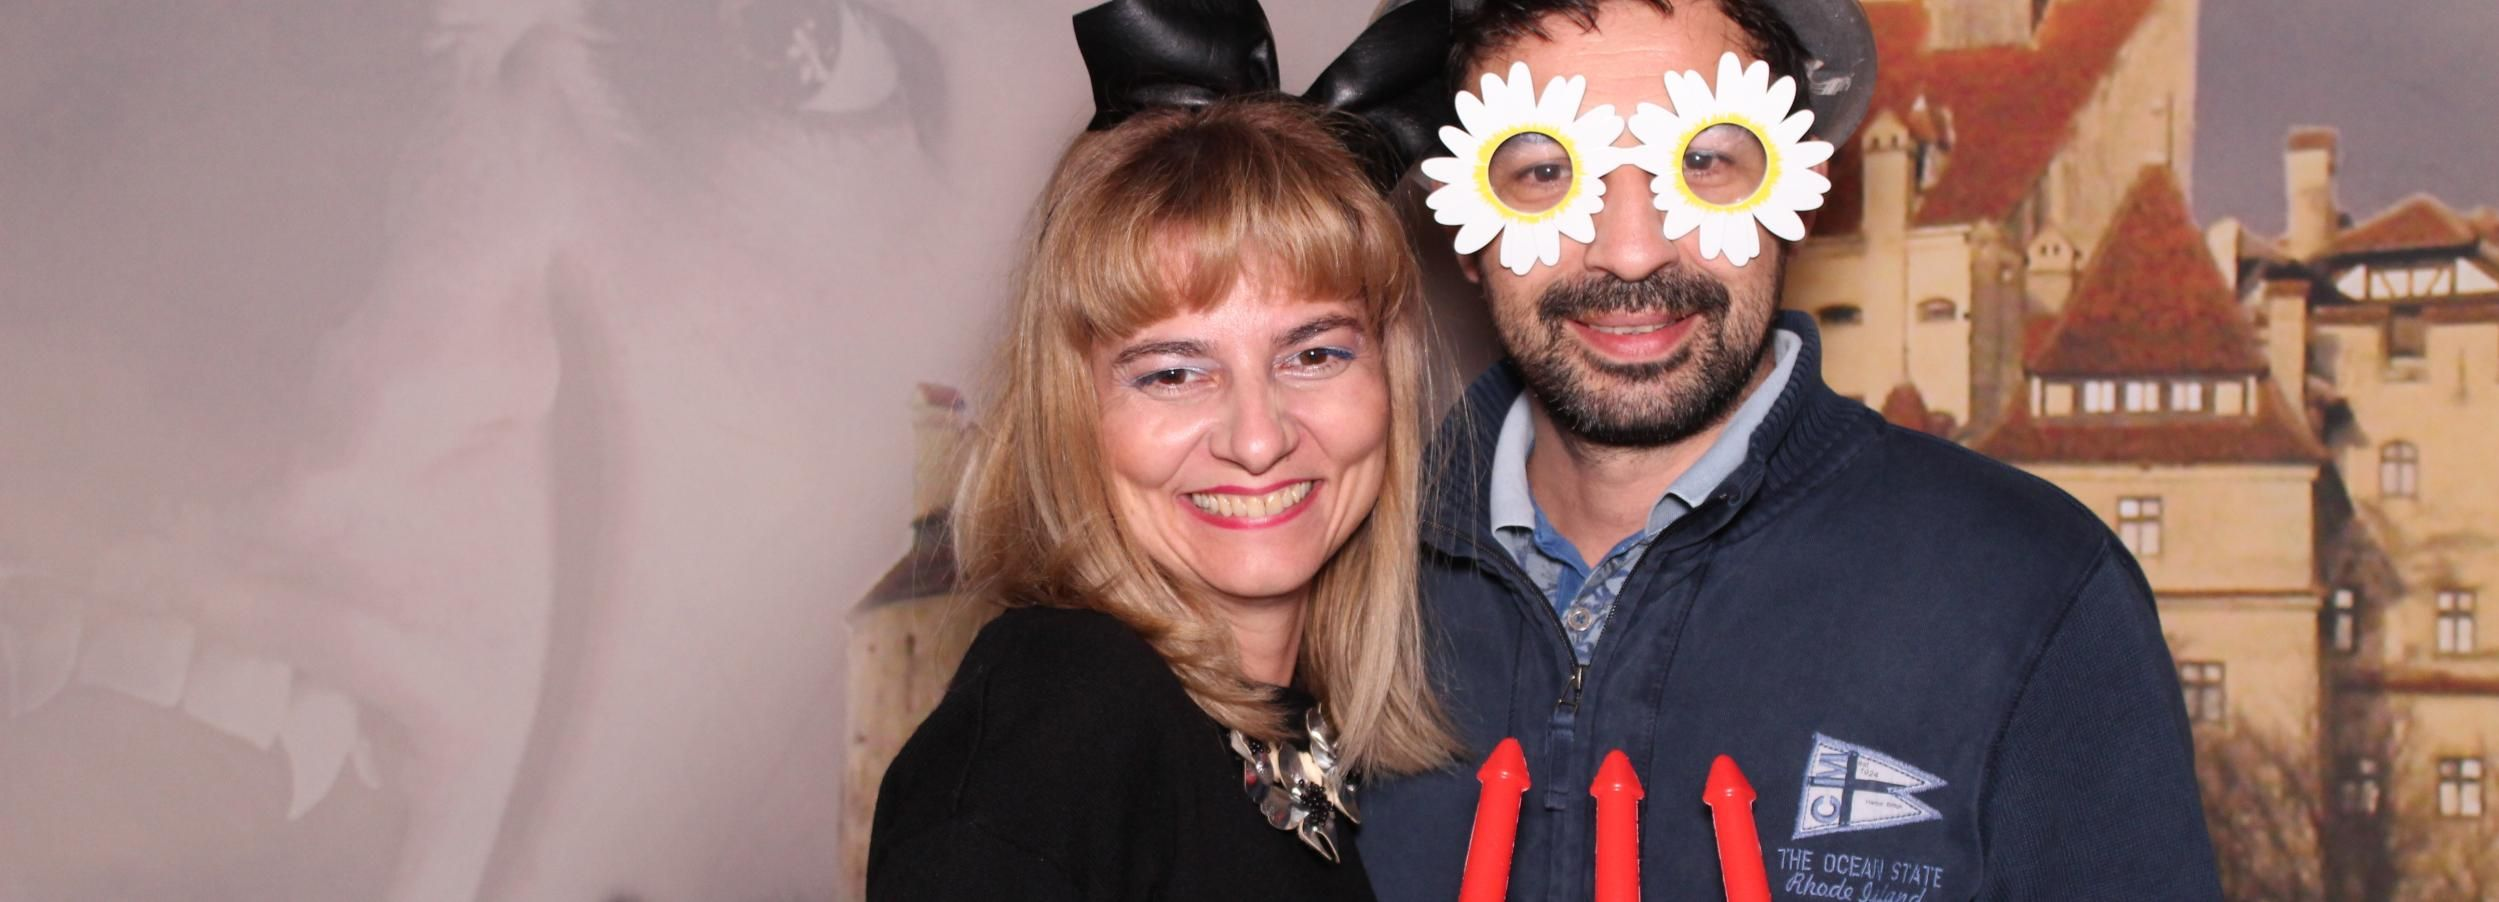 Sighisoara: Overnight Halloween Party in Transylvania